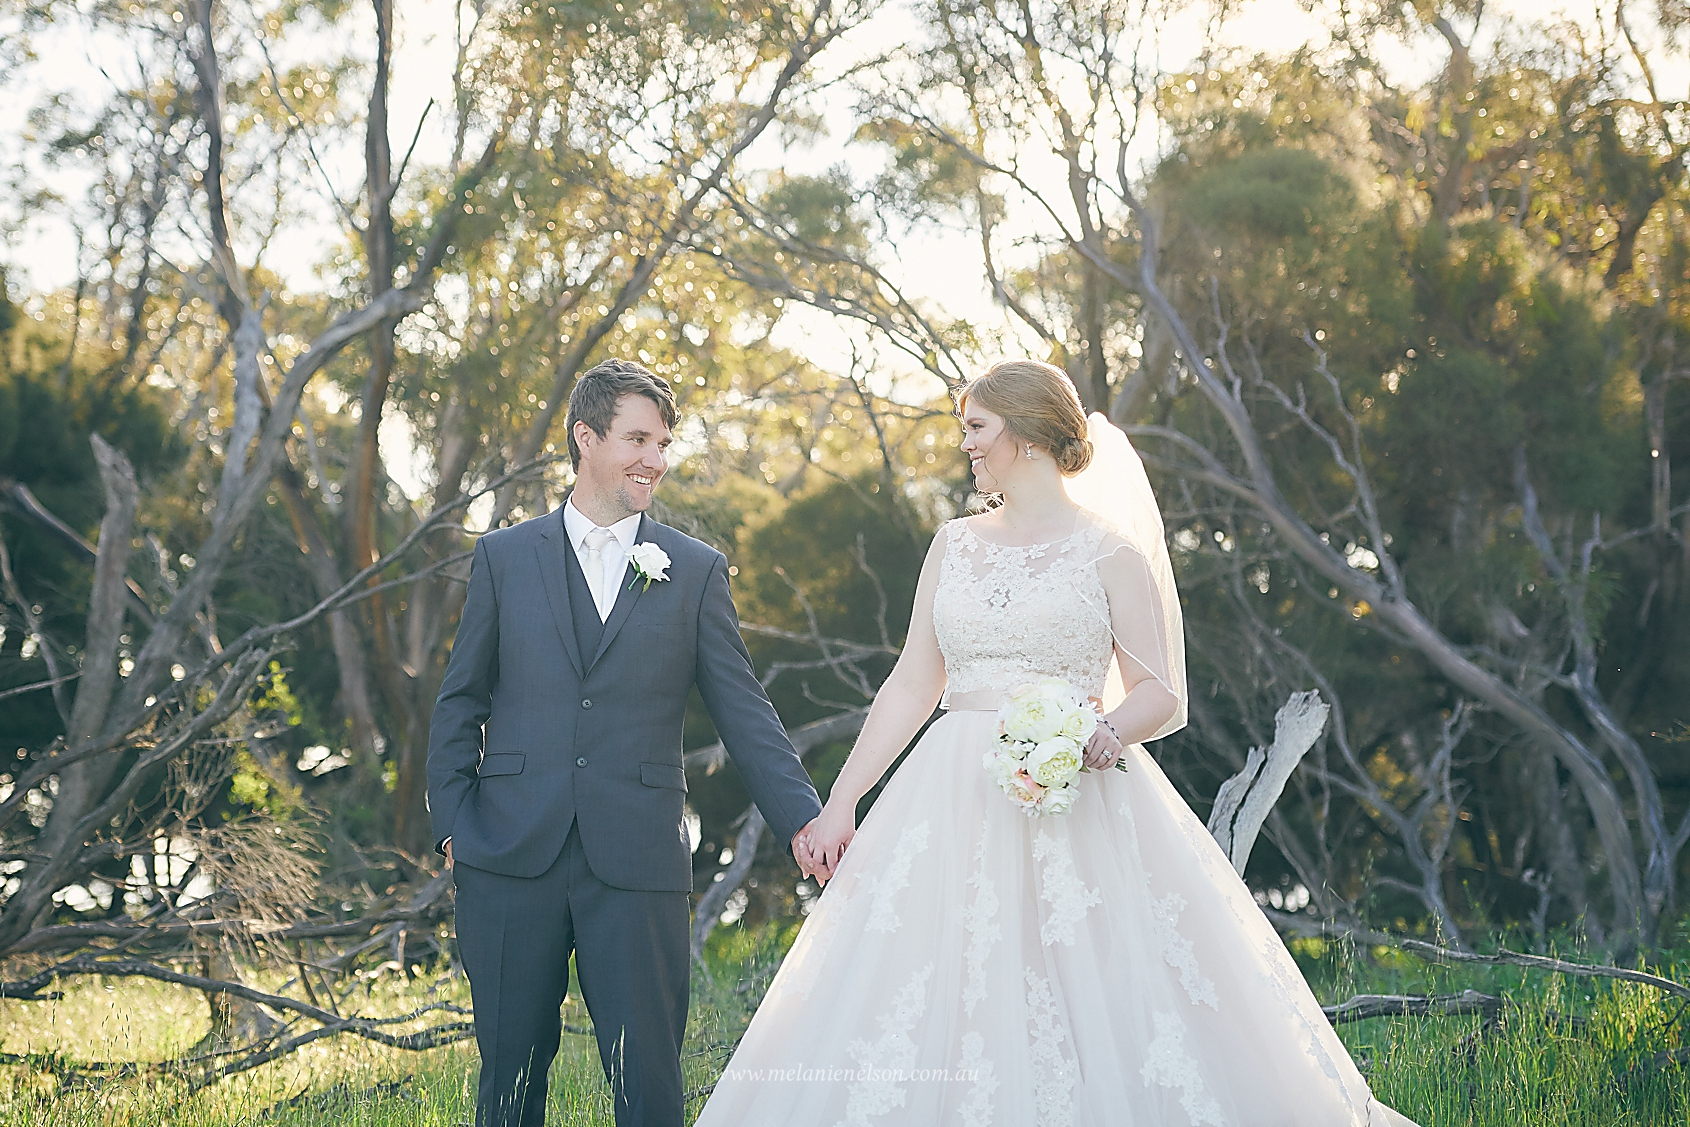 yorke_peninsula_wedding_photographer_0069.jpg